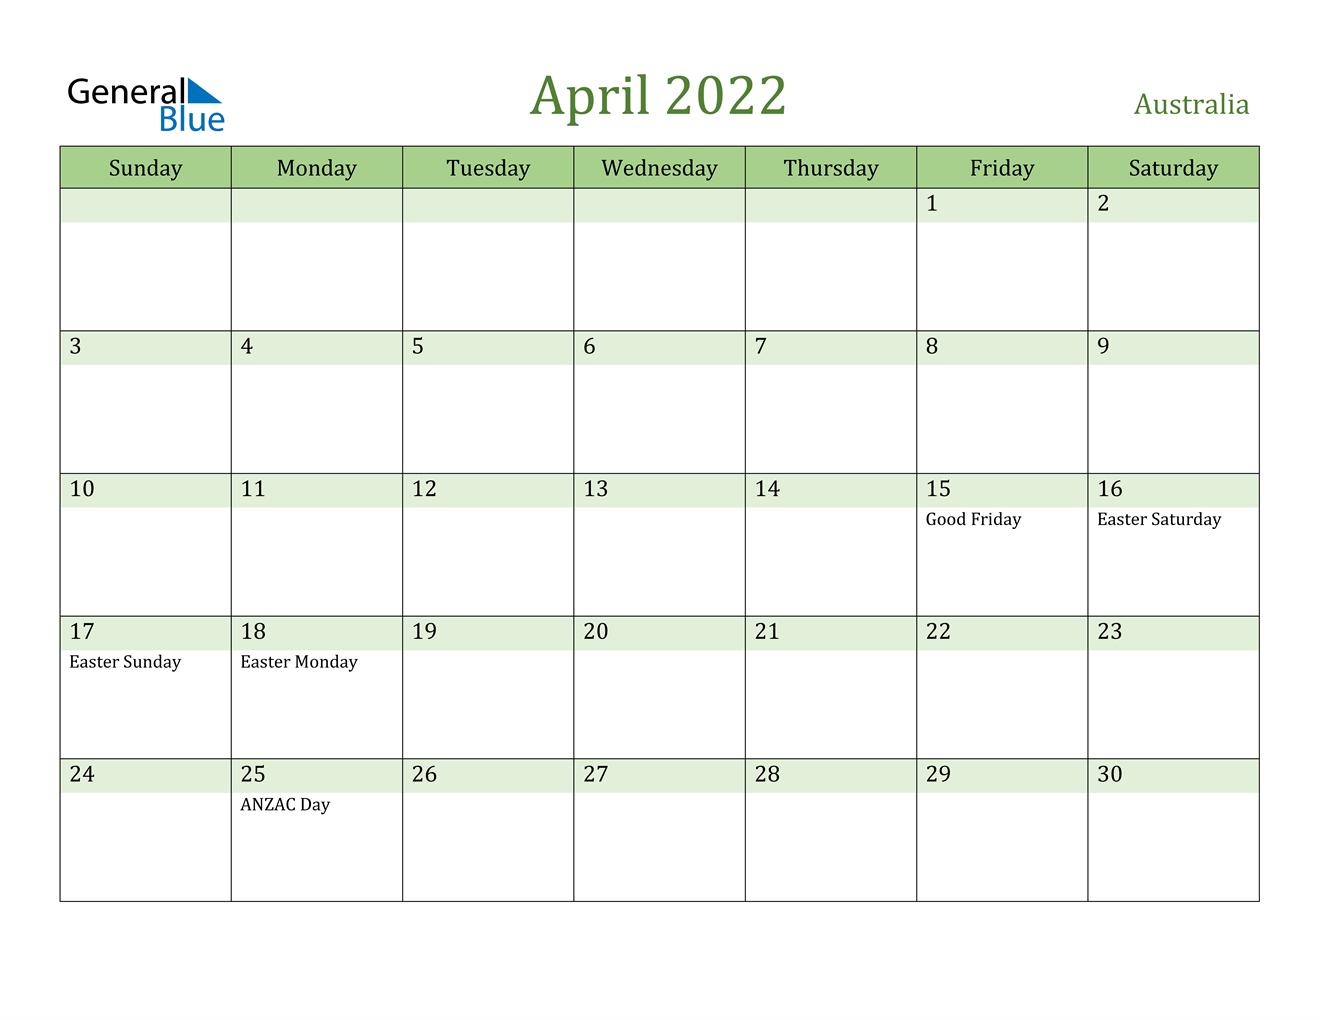 April 2022 Calendar - Australia throughout April 2022 Printable Calendar Free 2022 Graphics